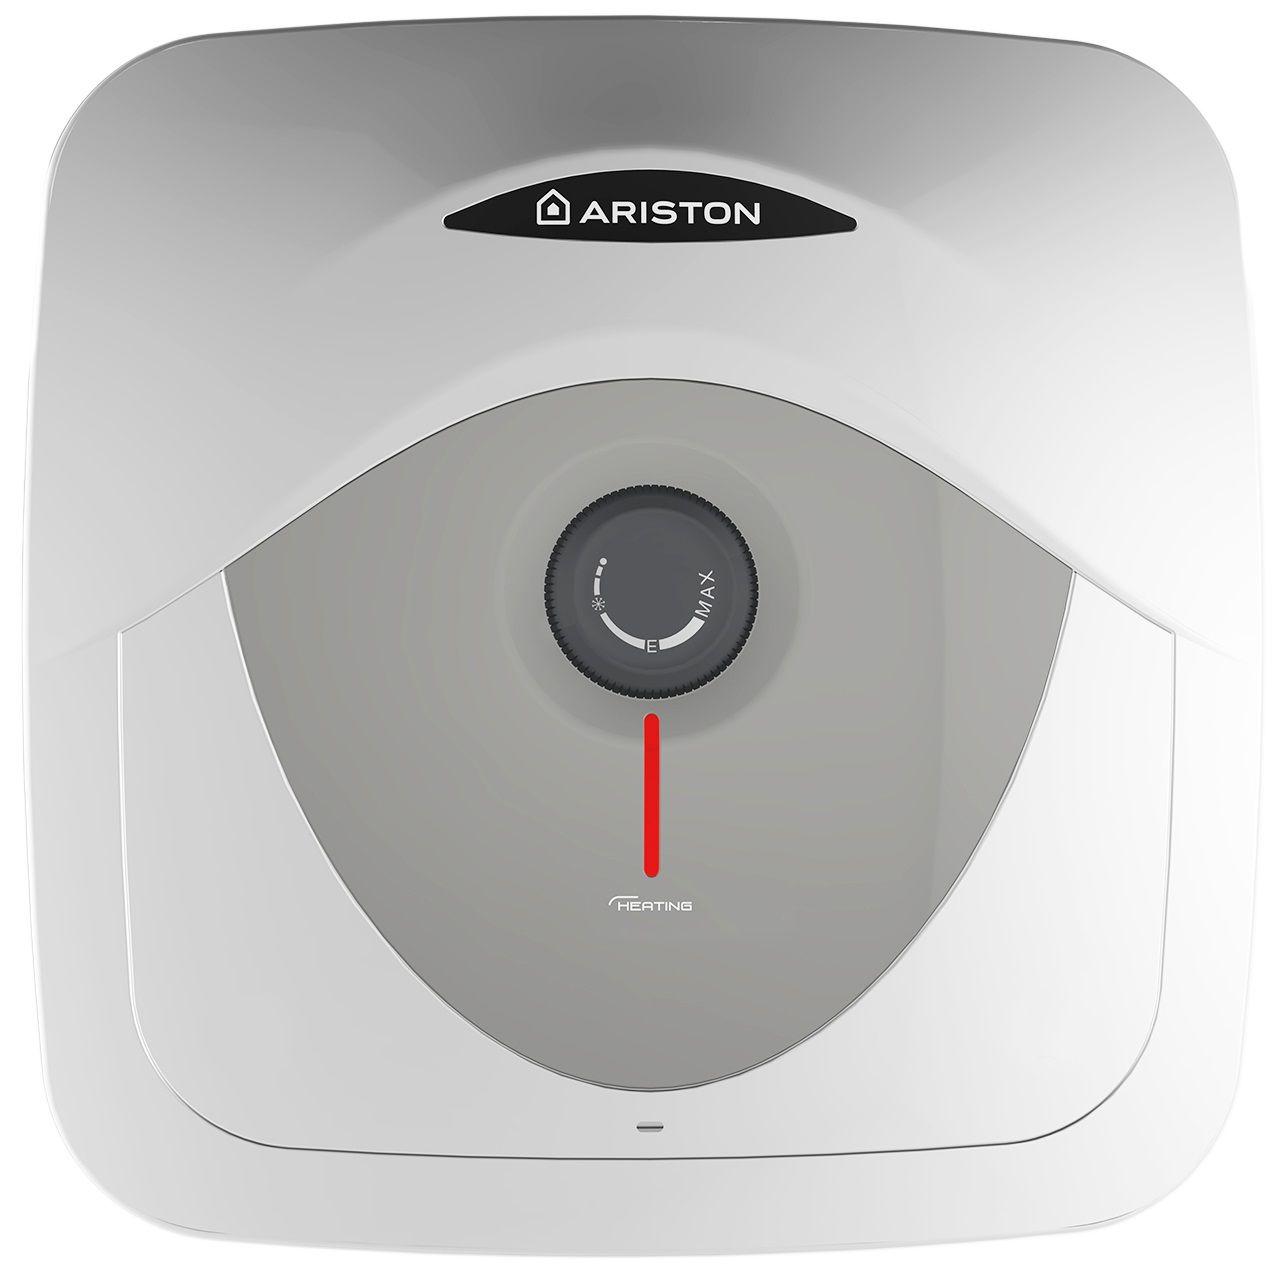 Boiler electric Ariston Andris RS 10 EU, 10 l, 1200 W, Led iluminat, Protectie electrica IPX1, Montare deasupra chiuvetei, Reglaj extern de temperatura